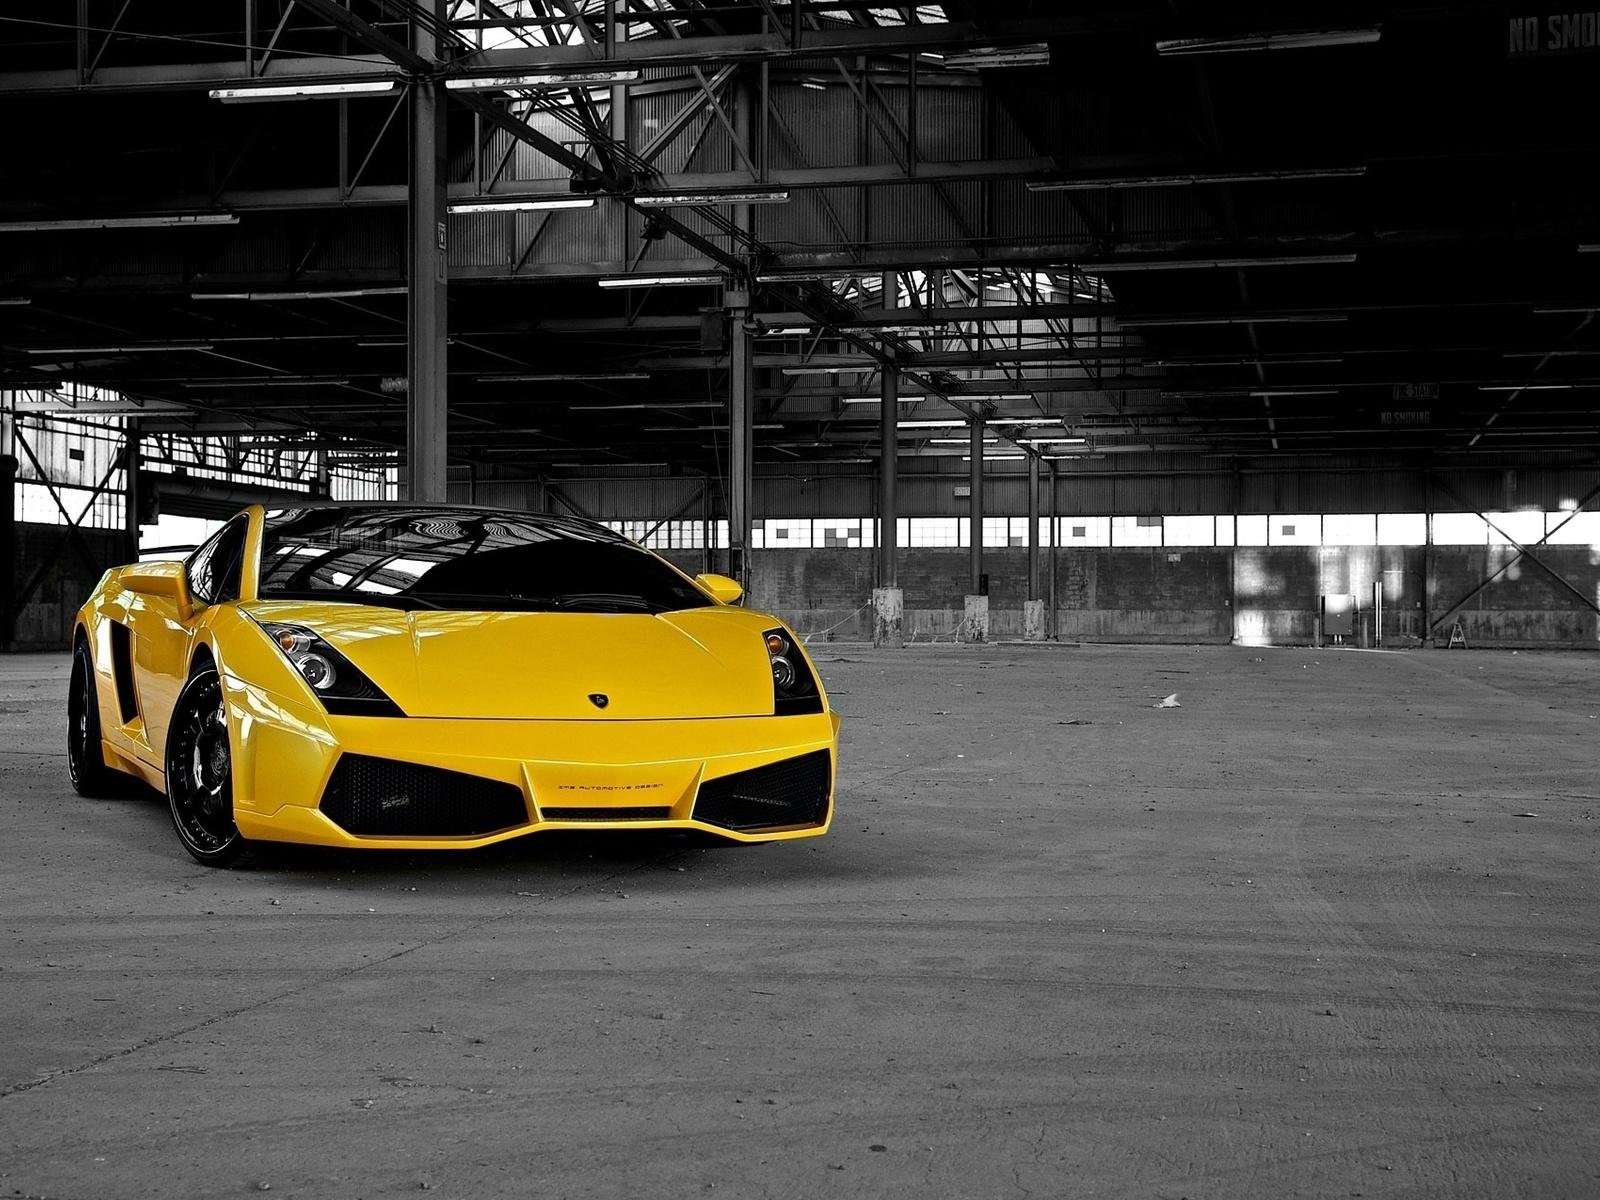 fotos de bonitos autos